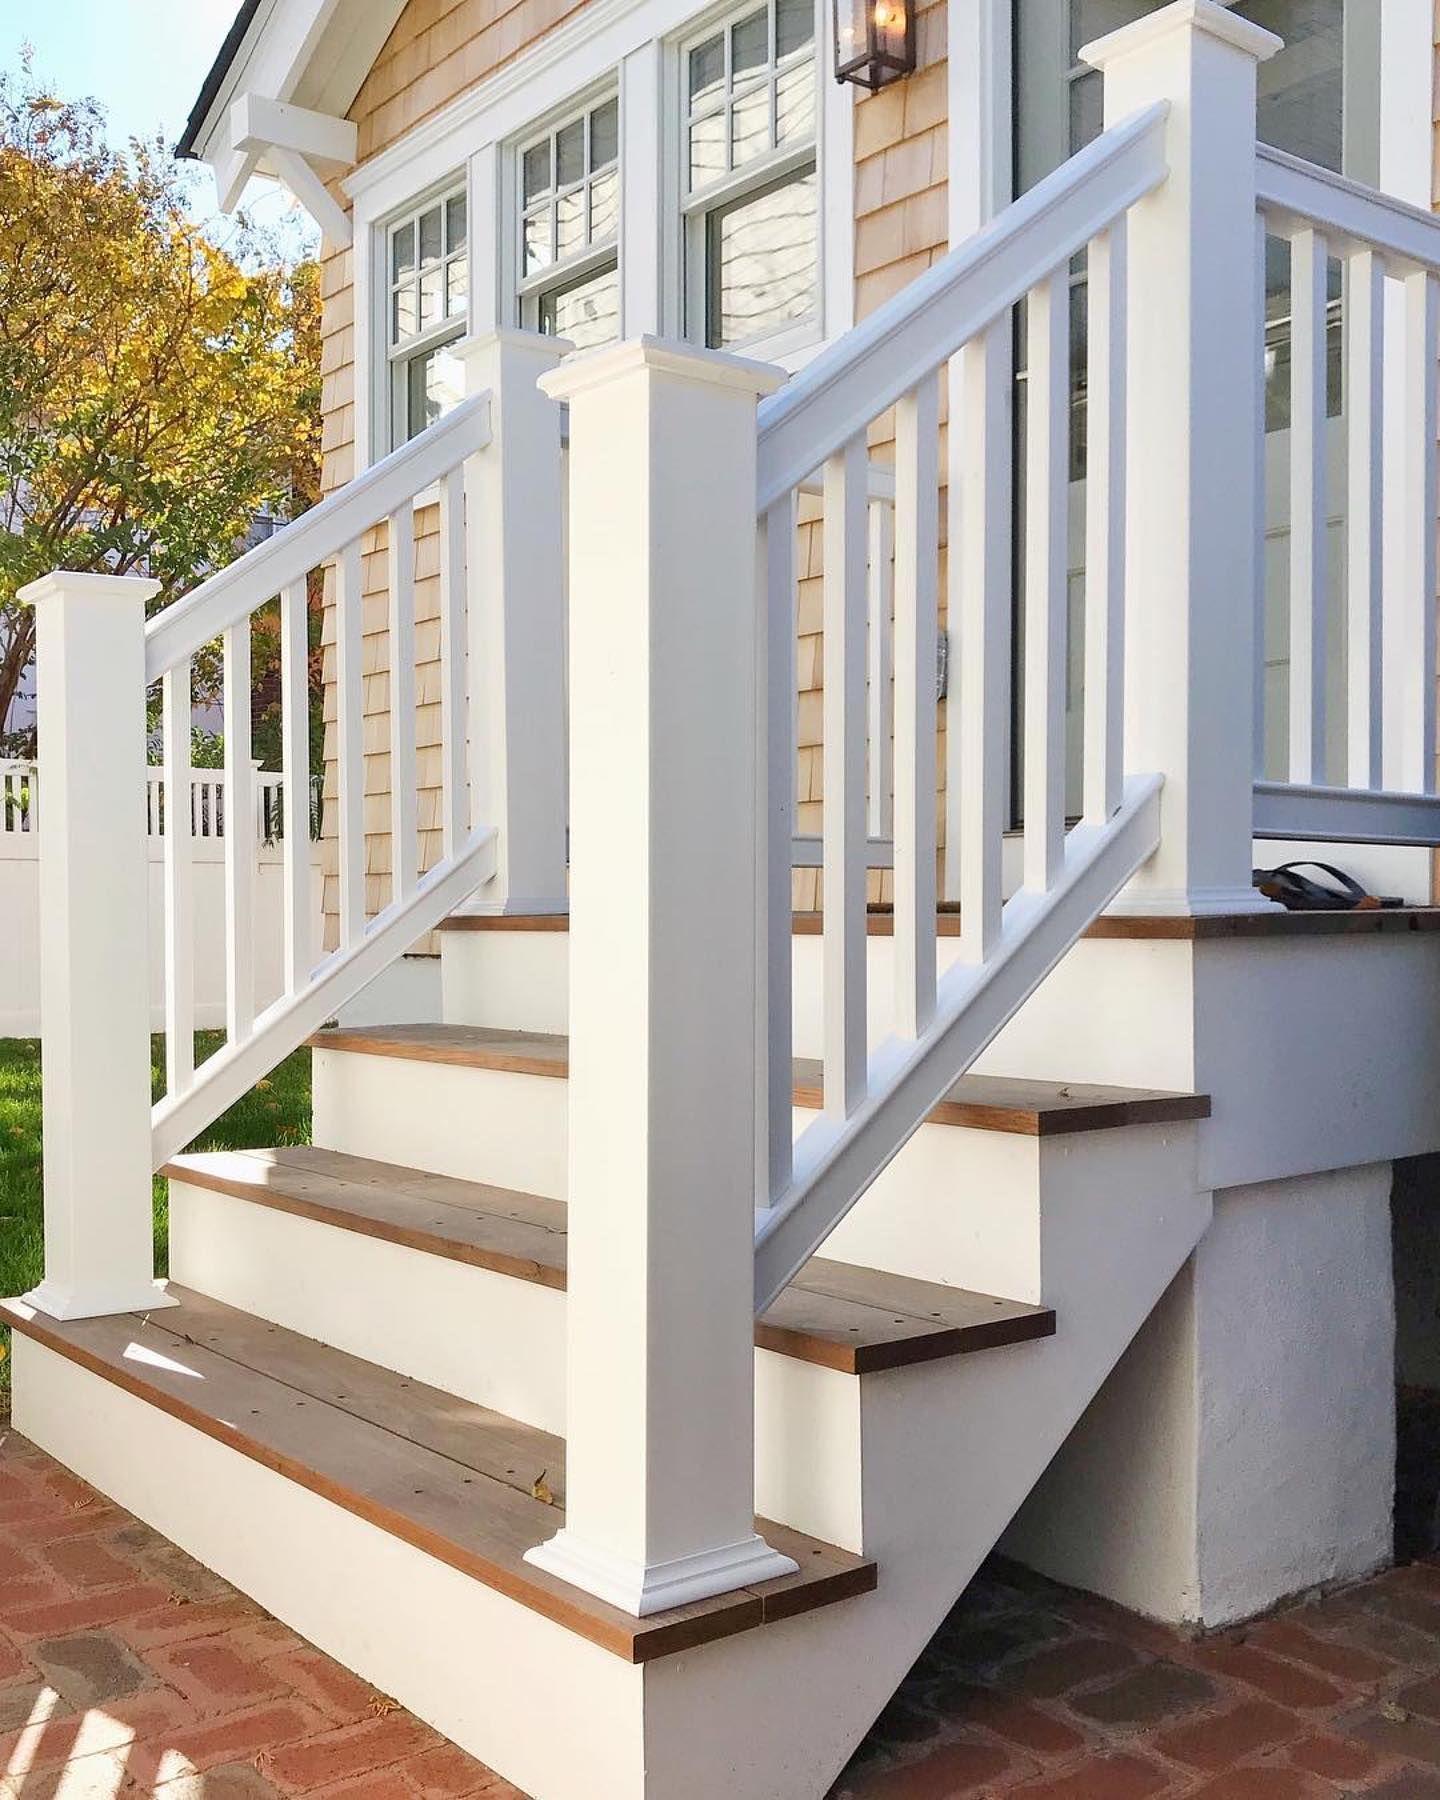 Best Newel Post Wraps Newel Posts Intex Porch Pillars 400 x 300